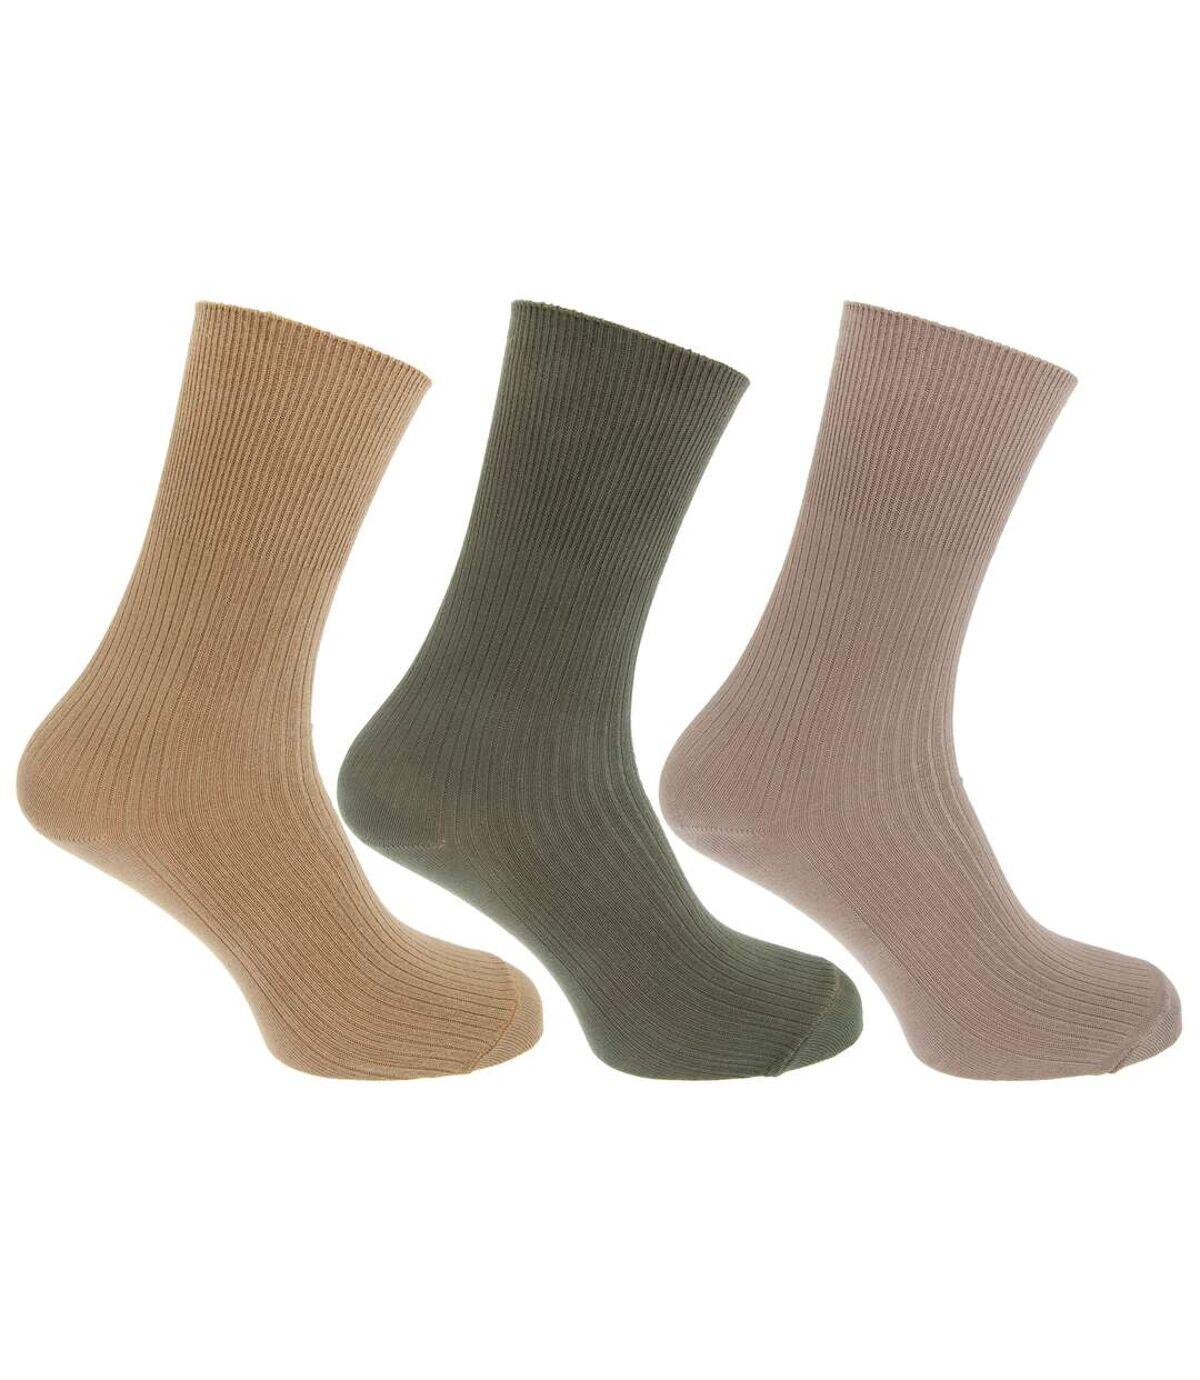 Mens Casual Non Elastic Bamboo Viscose Socks (Pack Of 3) (Beige/Green) - UTMB376